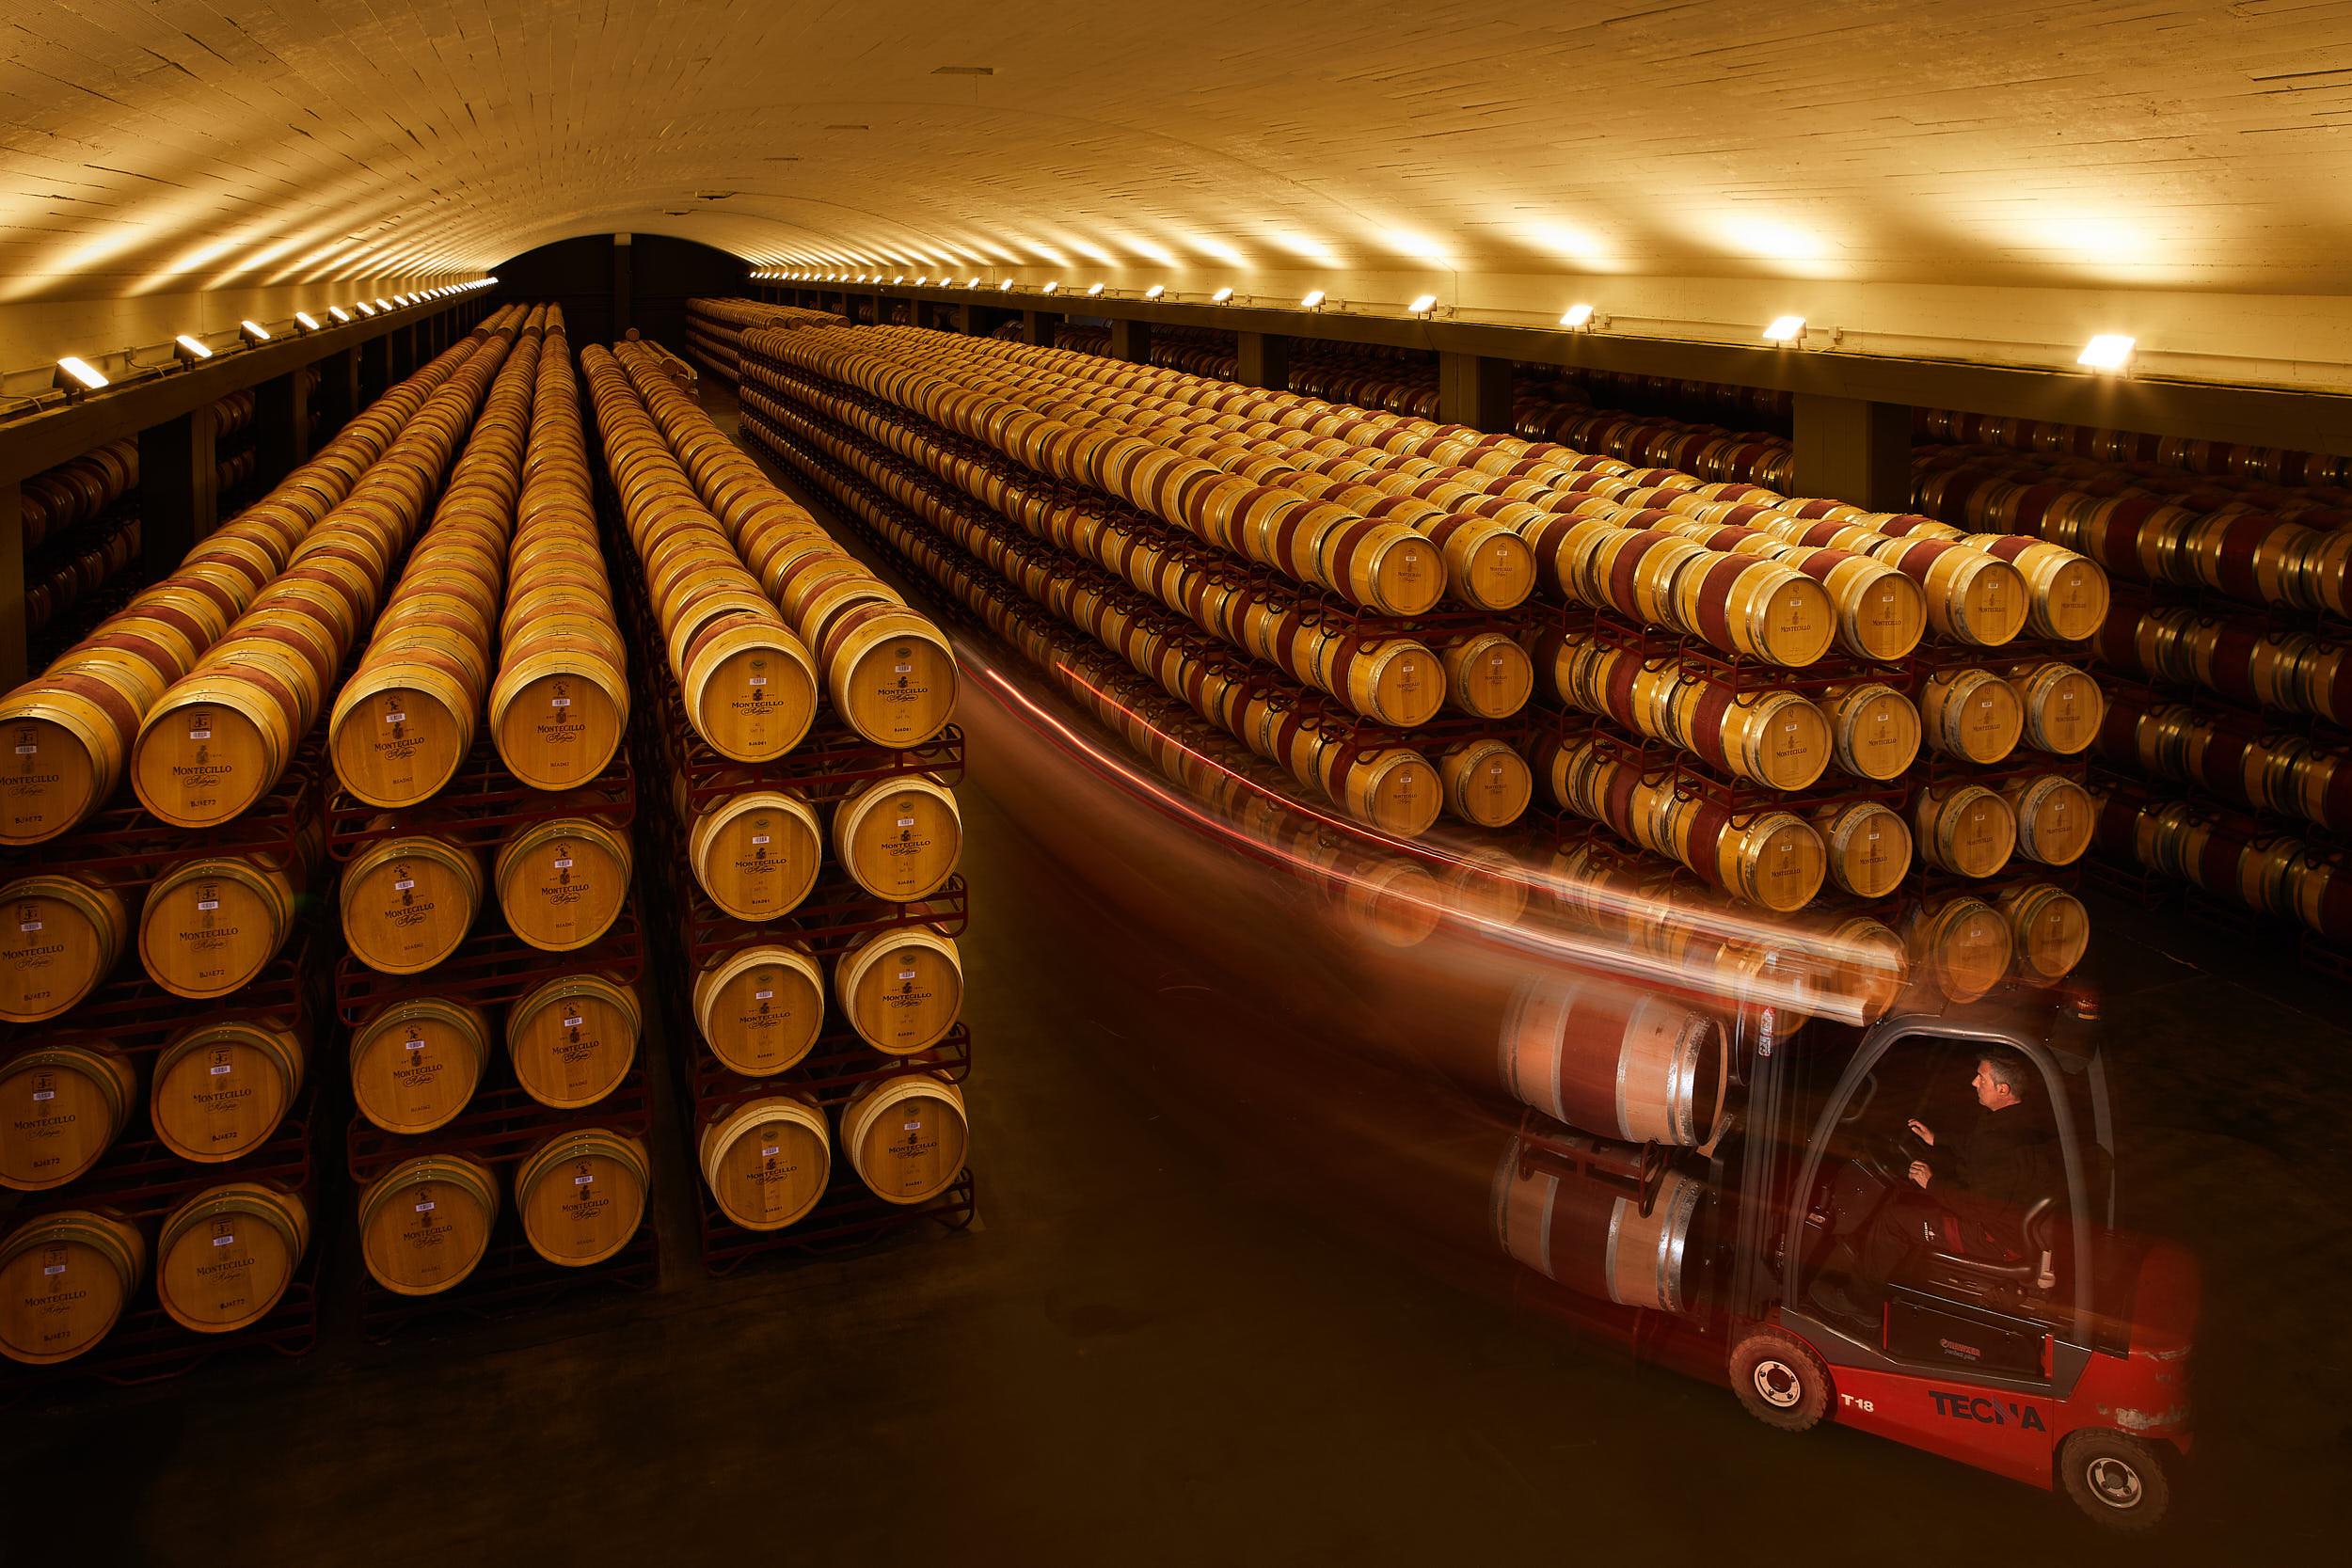 1806Basque_Country_Rioja_Spain_Corporate_Photographer_James_Sturcke_0004.jpg